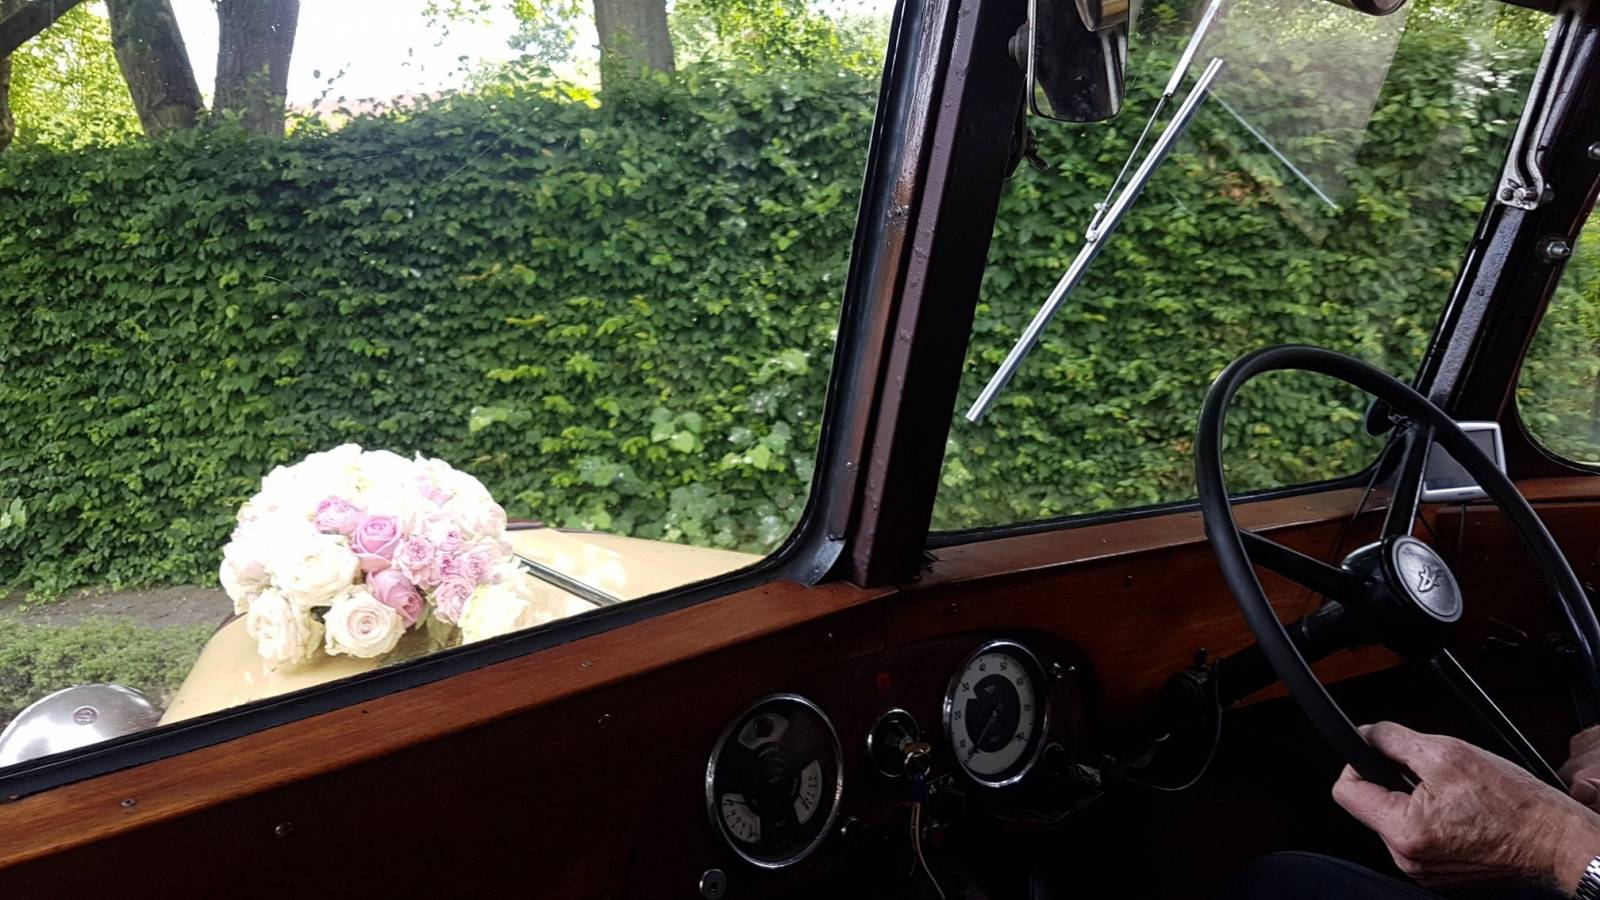 The London Ceremony Bus - Trouwvervoer - Ceremonievervoer - Bus - House of Weddings - 9